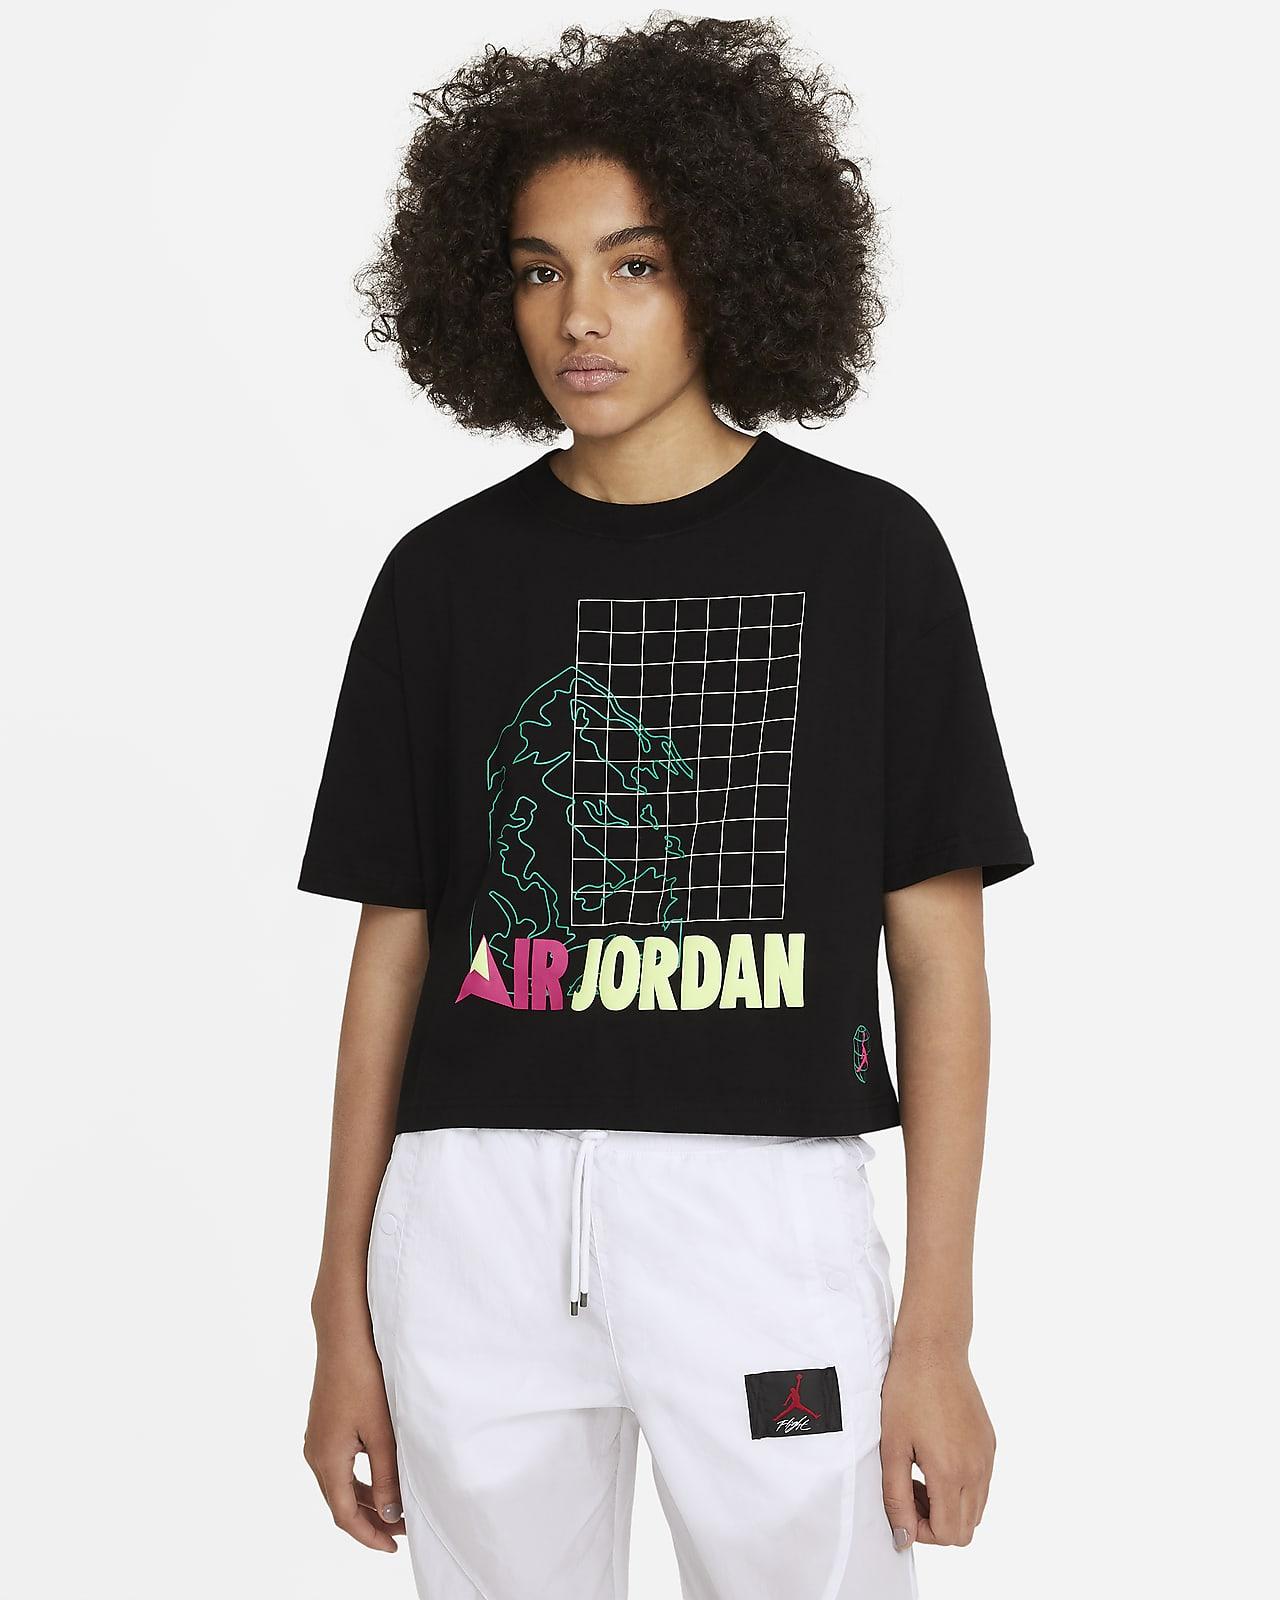 Jordan Winter Utility Women's Short-Sleeve Boxy T-Shirt